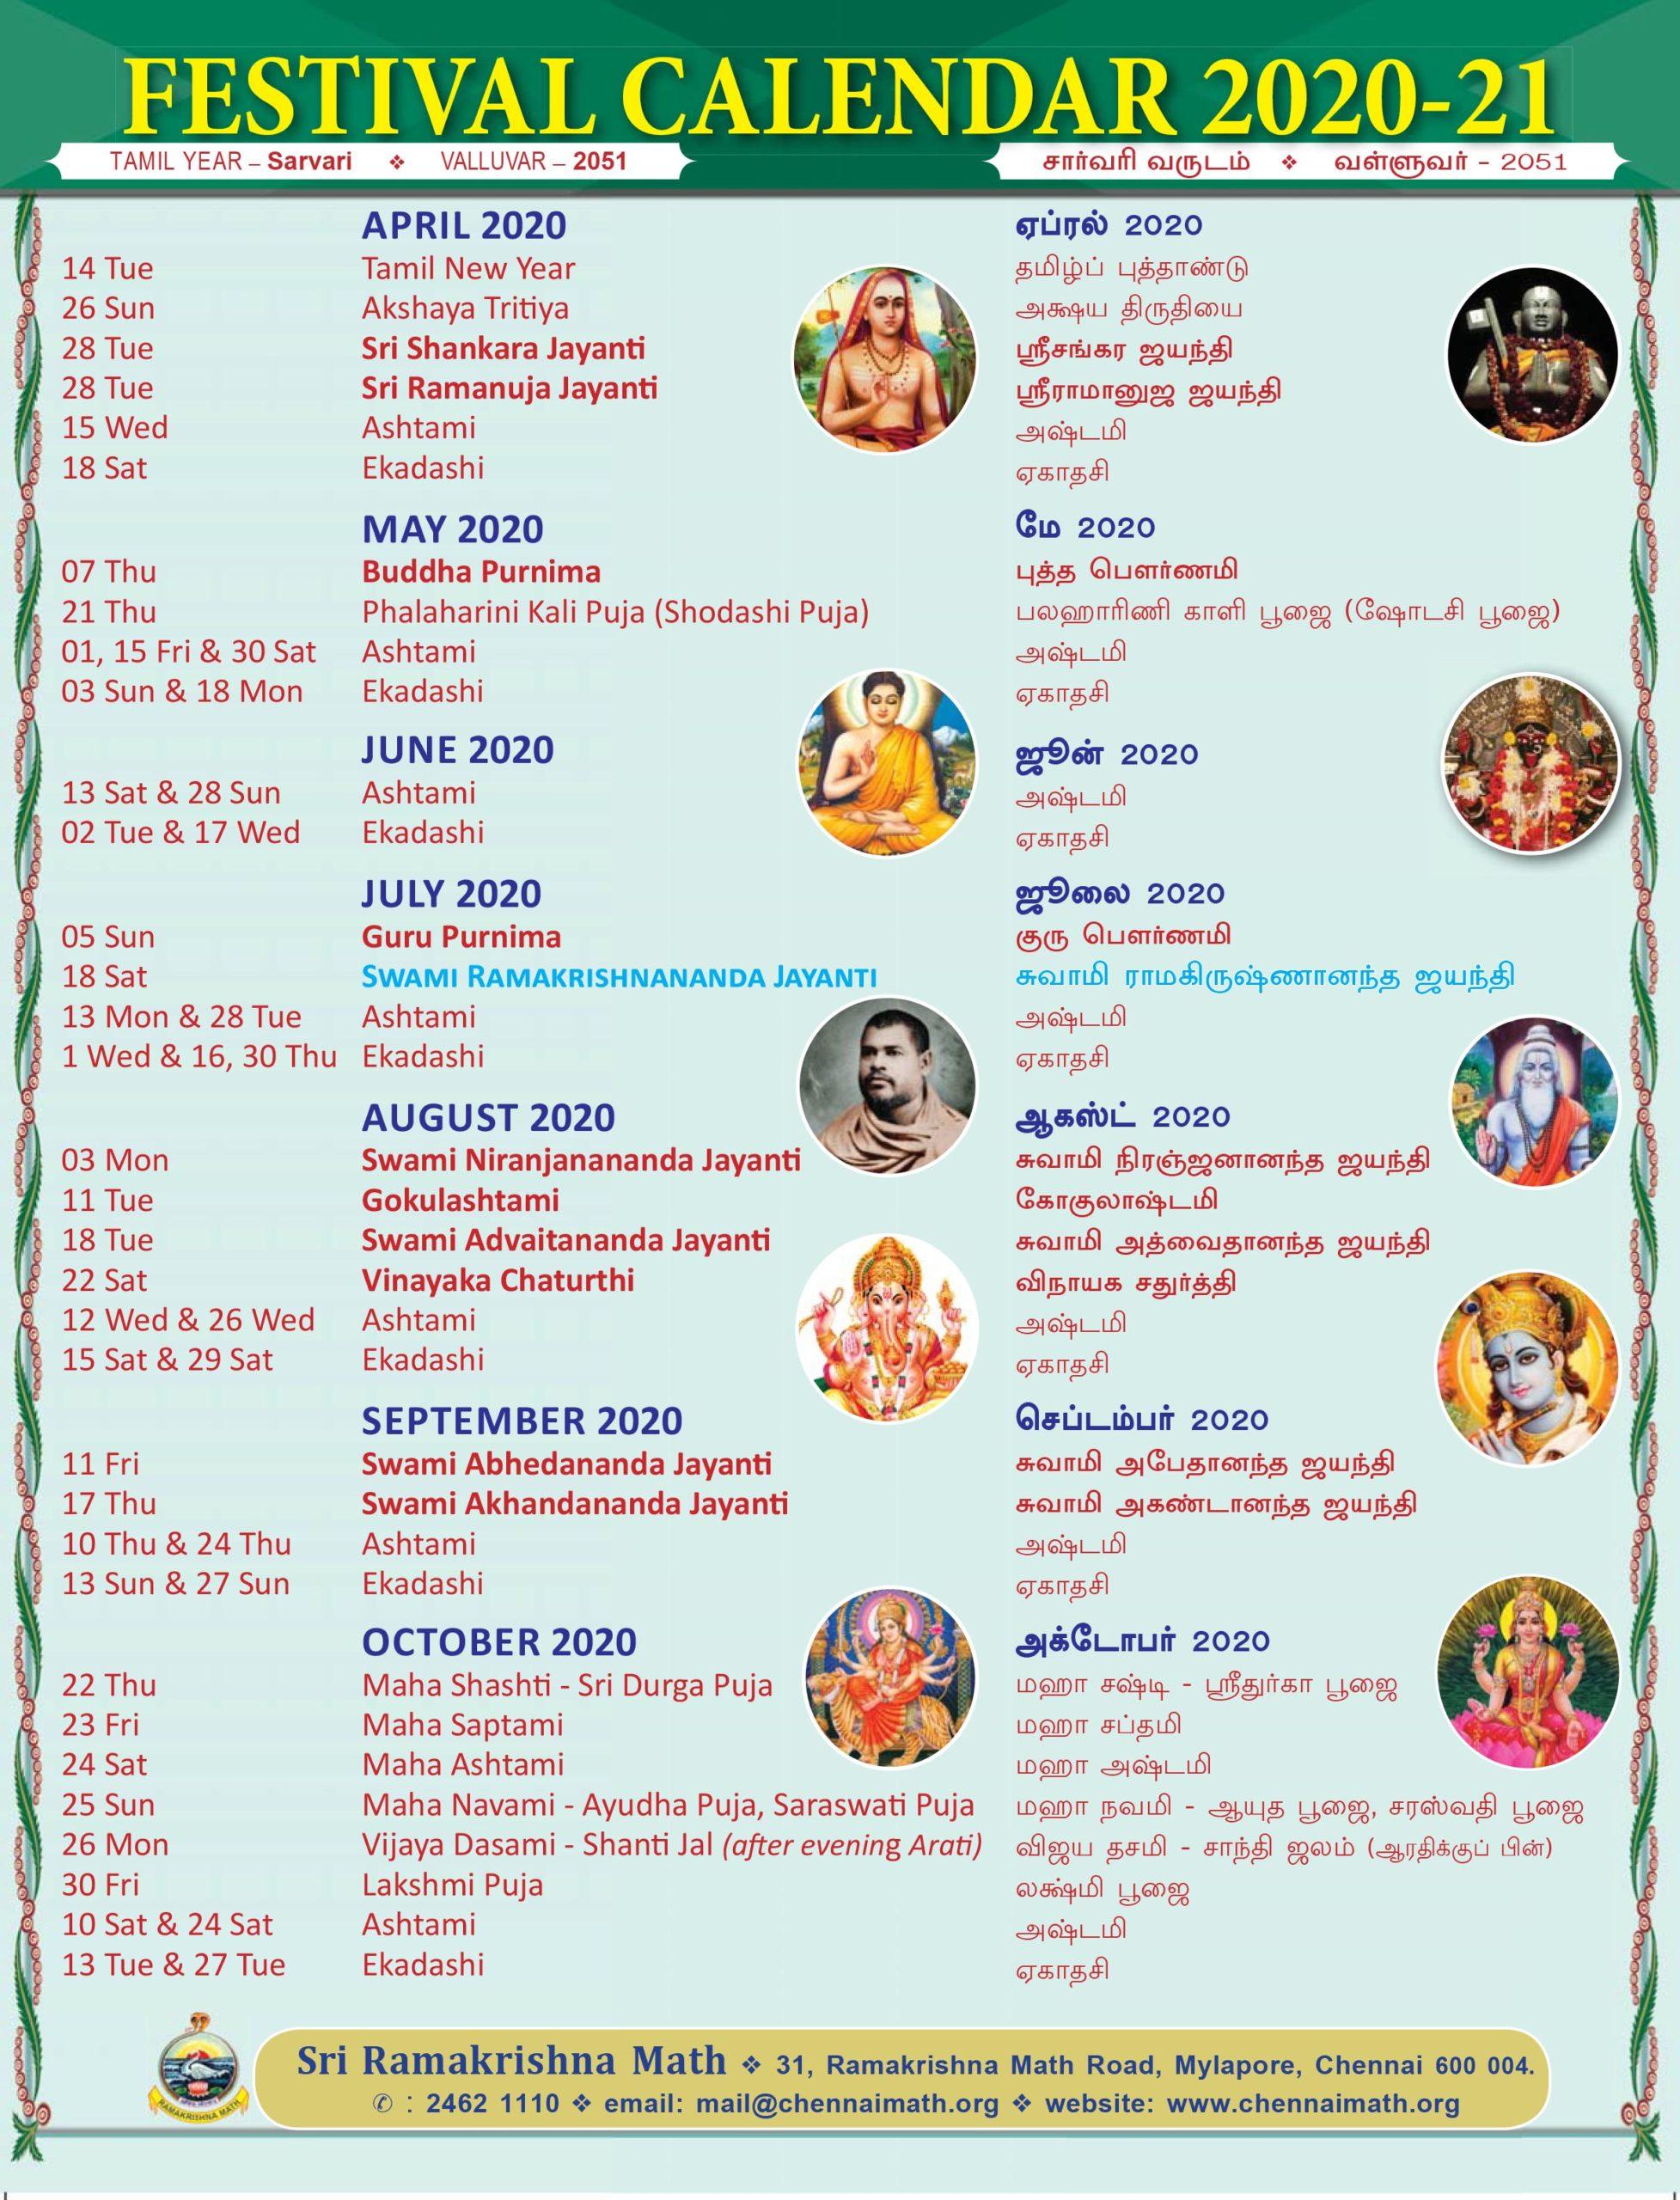 Ramakrishna Math Media Gallery | Festival Calendar 2020-21